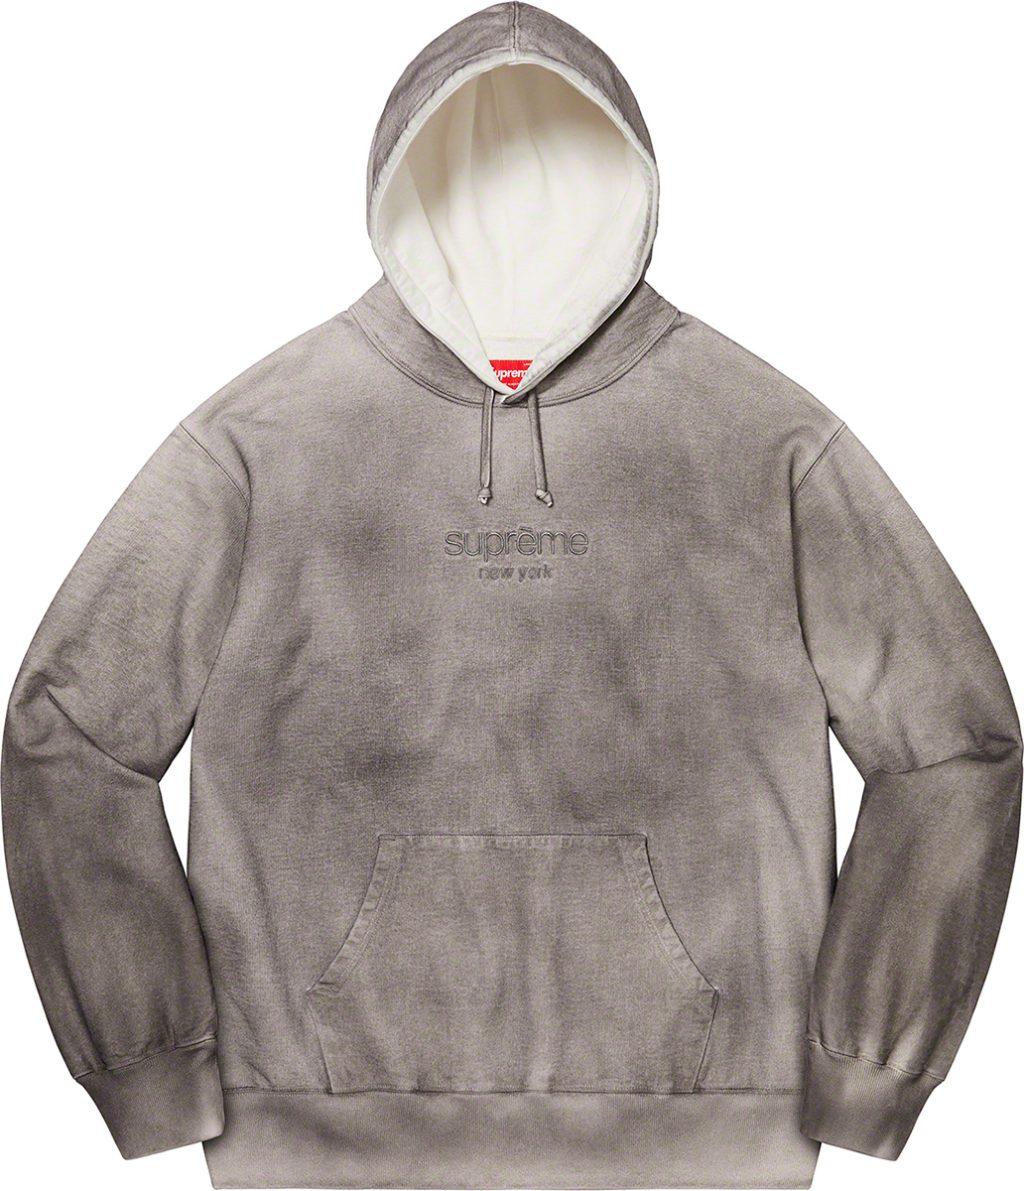 supreme-20aw-20fw-spray-hooded-sweatshirt